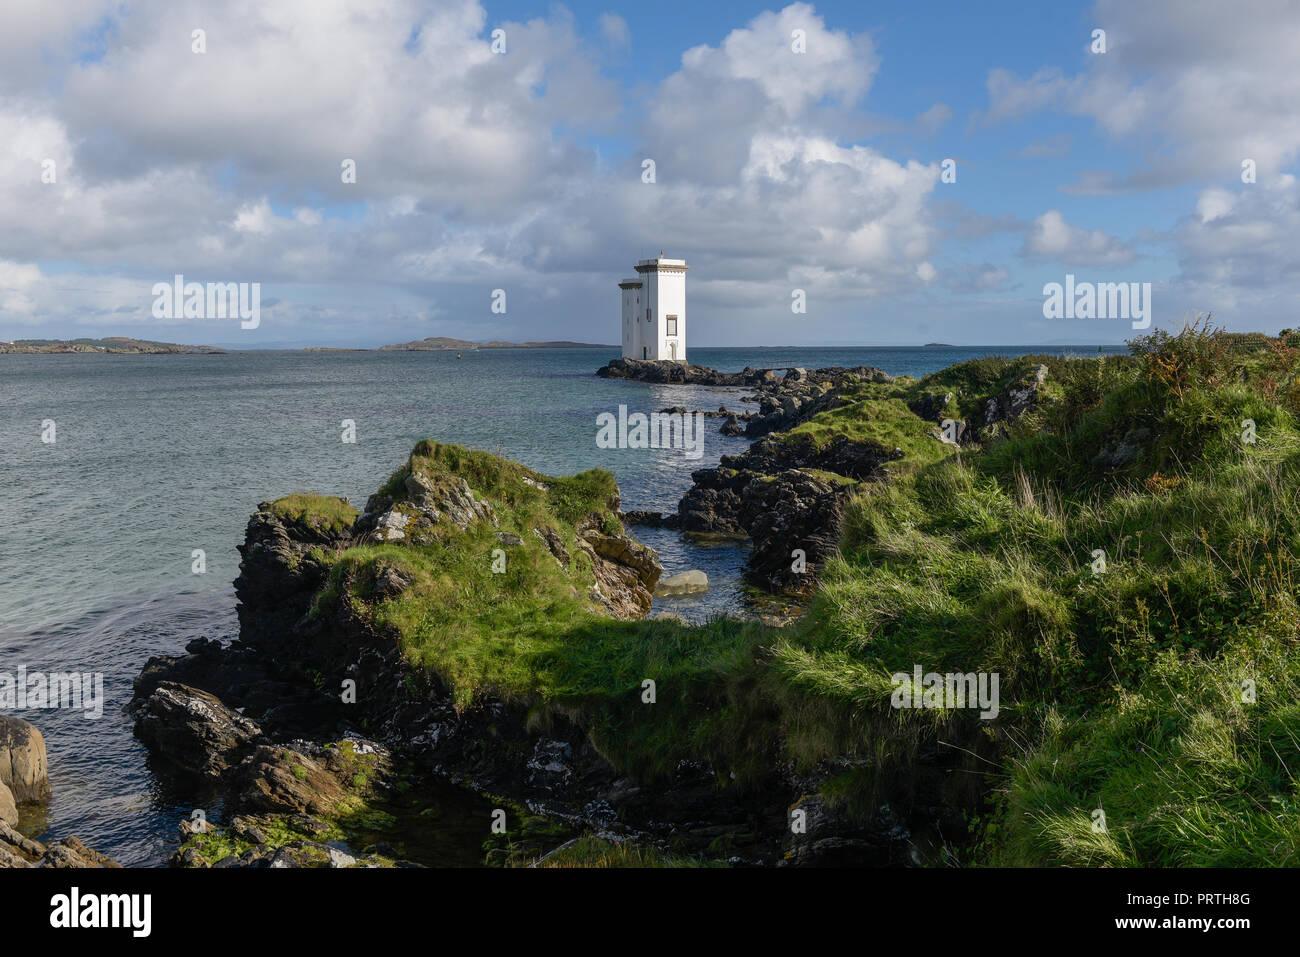 Carriage Fhada Lighthouse Port Ellen on The Isle of Islay Scotland - Stock Image